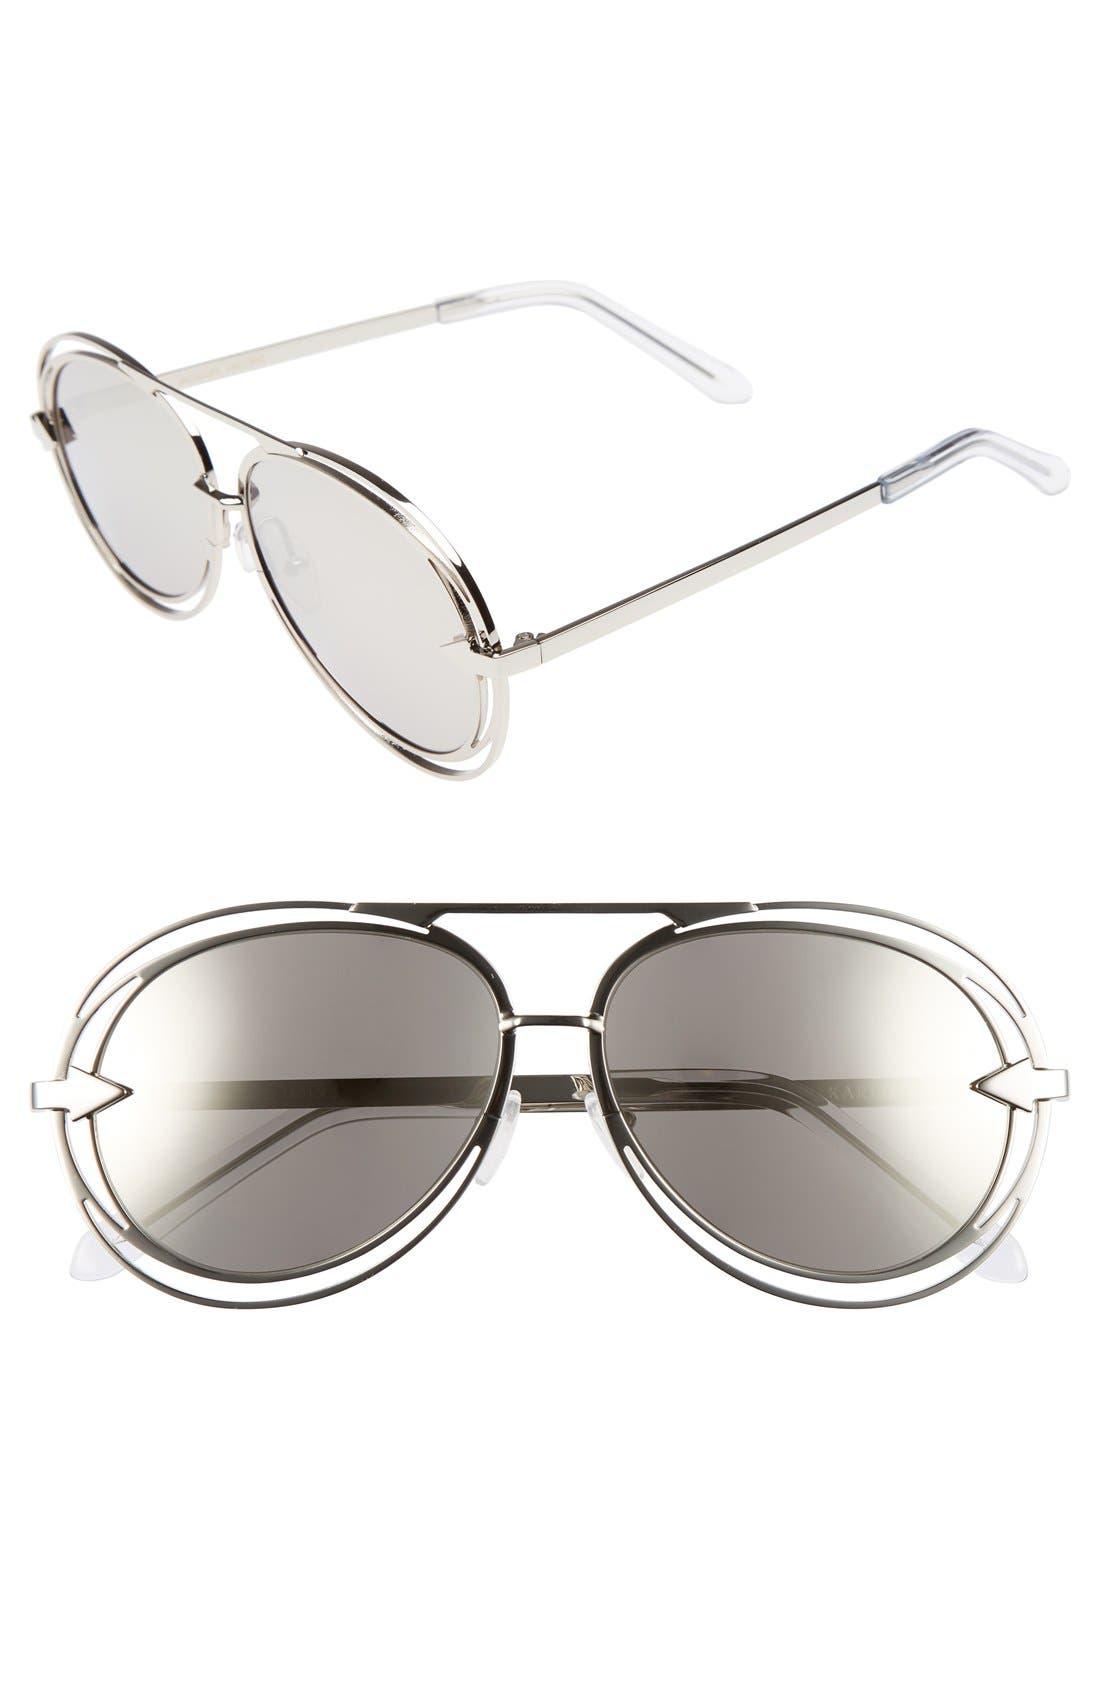 'Jacques' Aviator 57mm Sunglasses,                             Main thumbnail 1, color,                             040